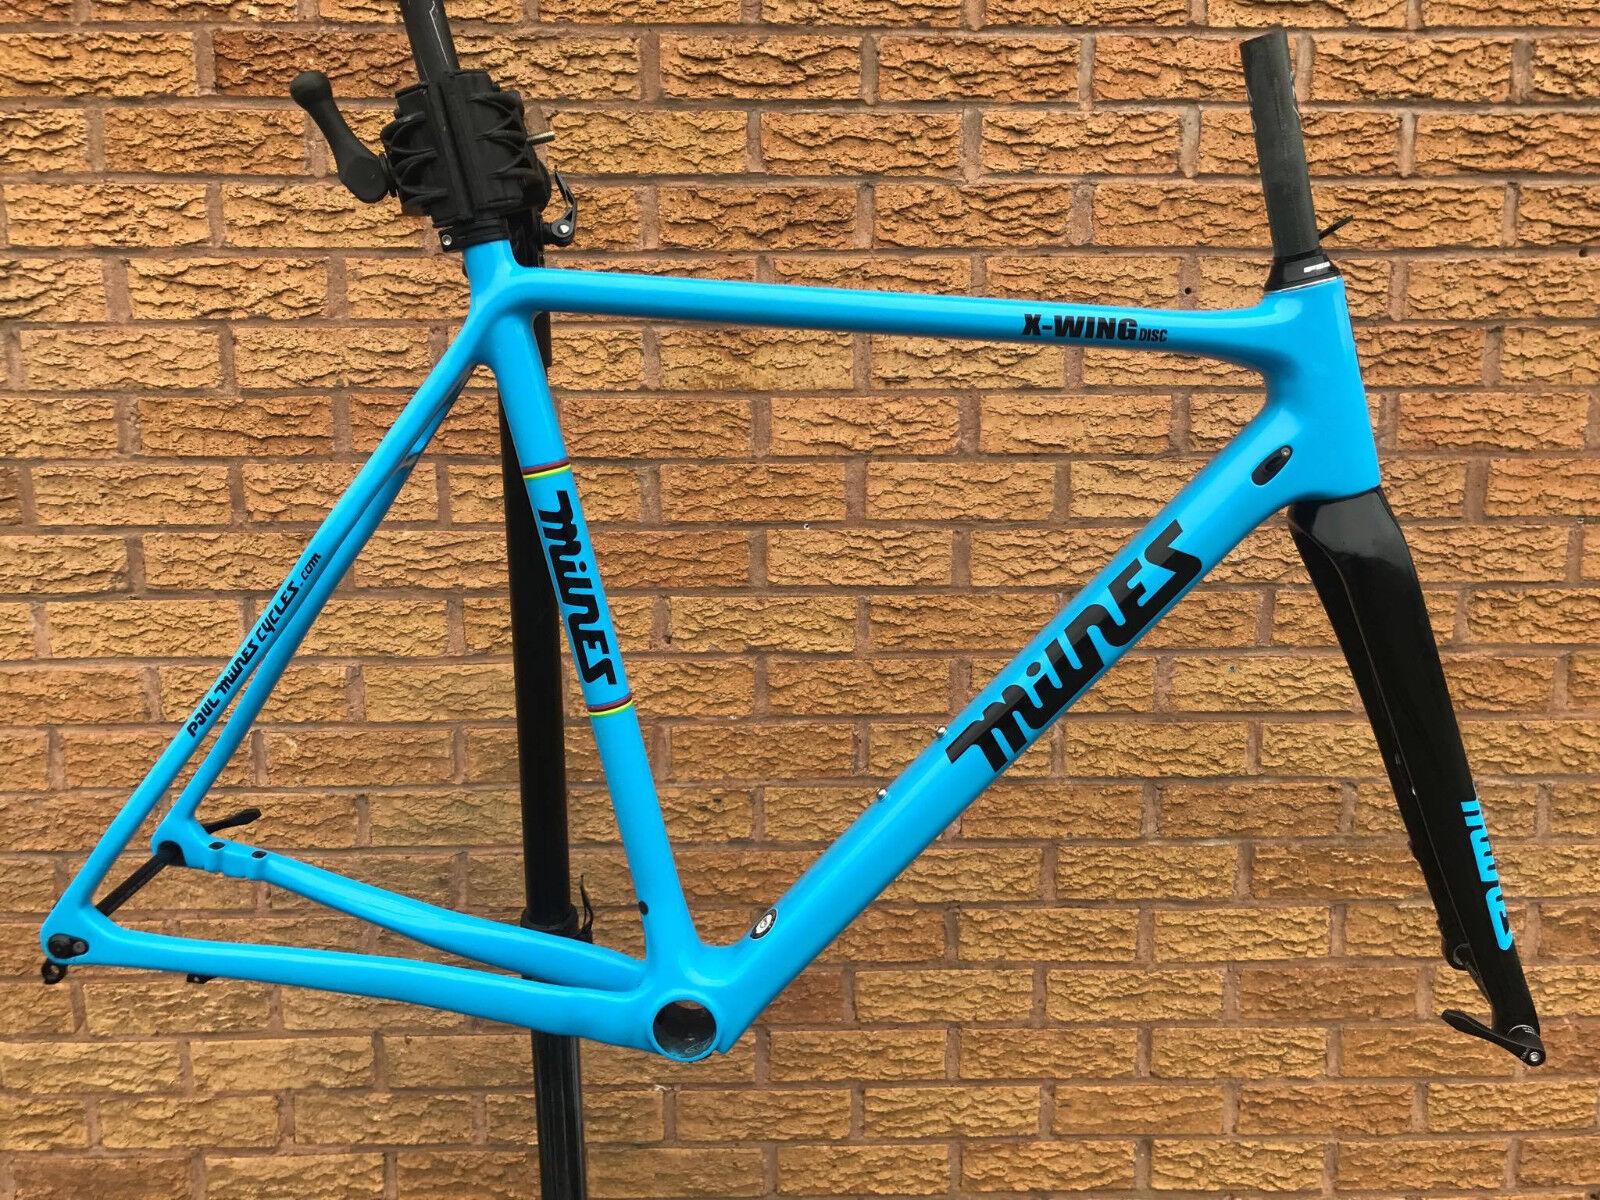 Paul Milnes X-Wing Disc Brake Carbon Cyclocross Bike Frameset - bluee 54cm